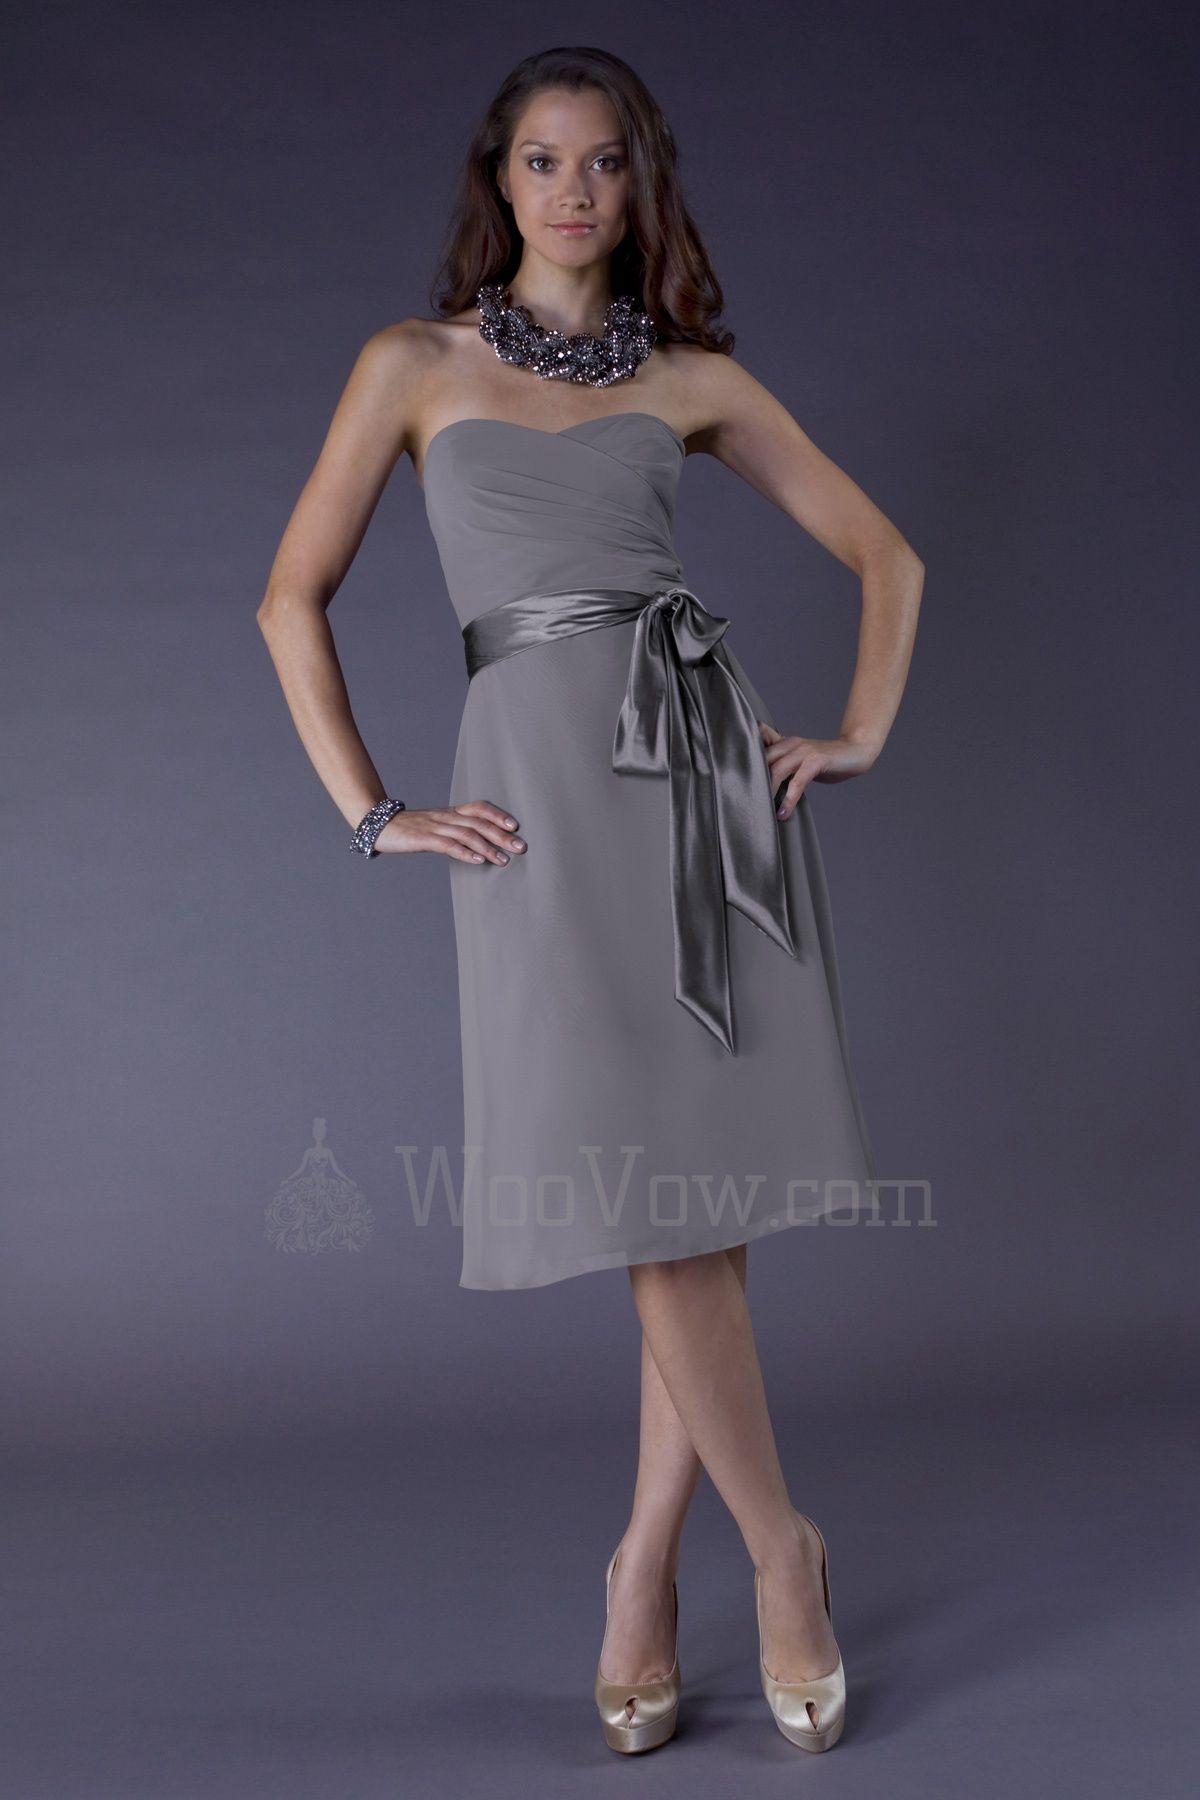 A-line Chiffon Sweetheart Neckline Wrap Bodice Short Prom Dress [WV783421] - $99.00 : Wedding Dresses